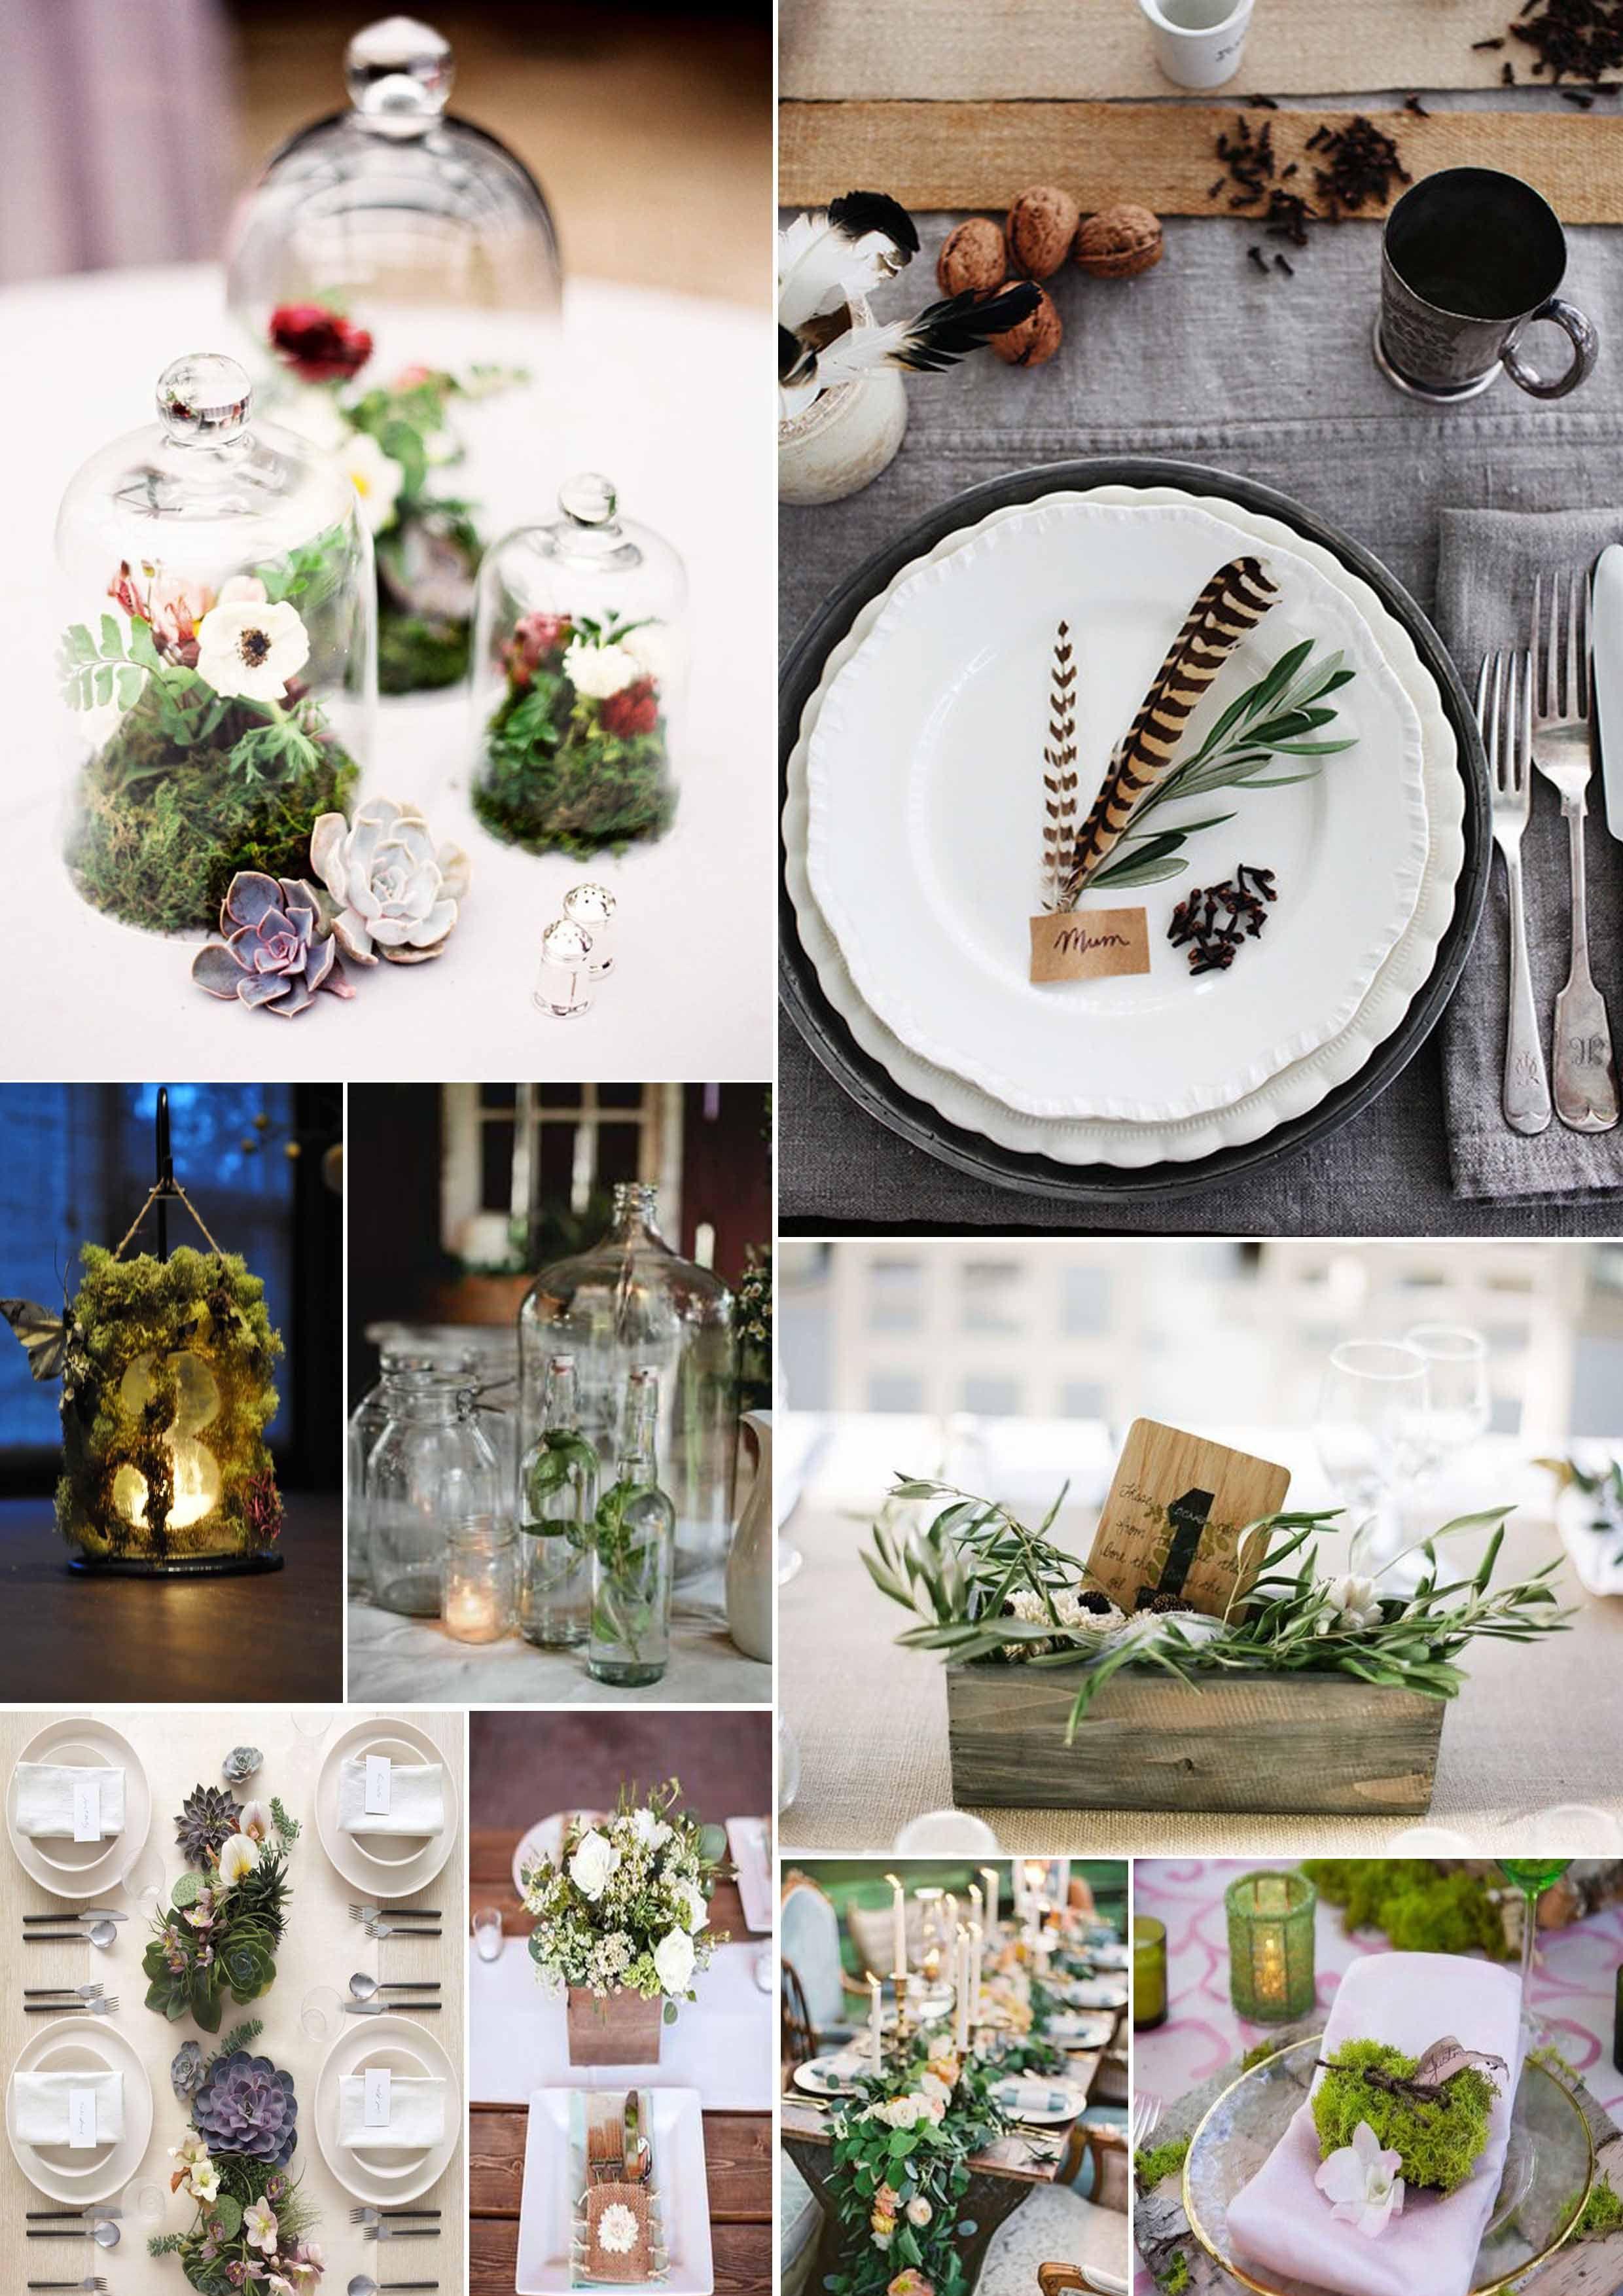 Woodlands and forest wedding decor ideas httpyesbabydaily woodlands and forest wedding decor ideas junglespirit Images